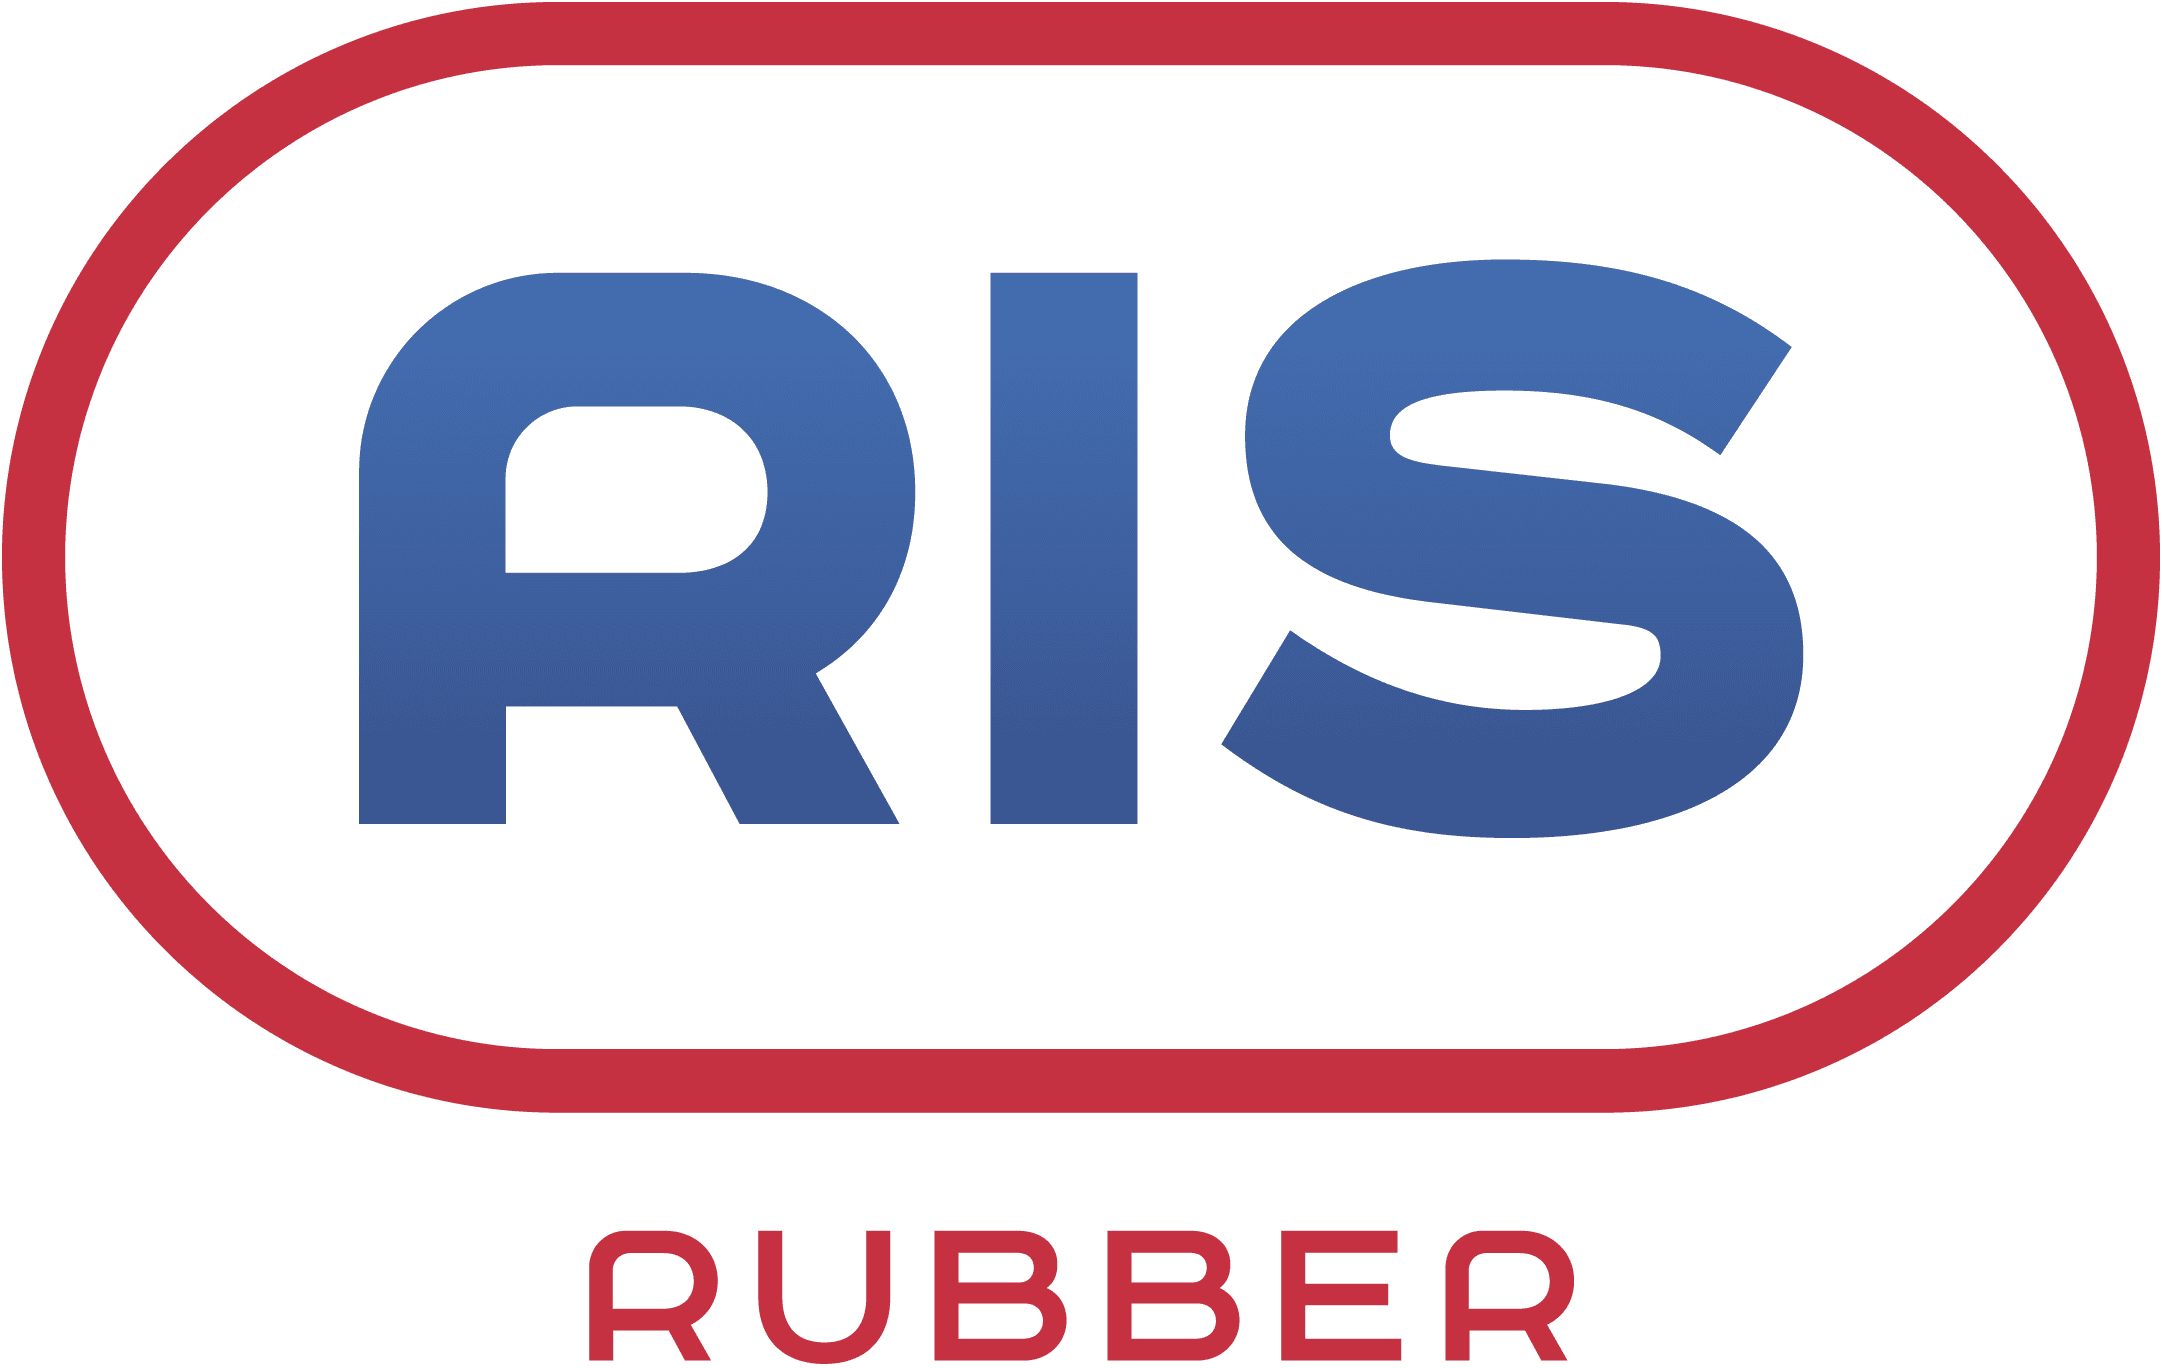 RIS : Brand Short Description Type Here.